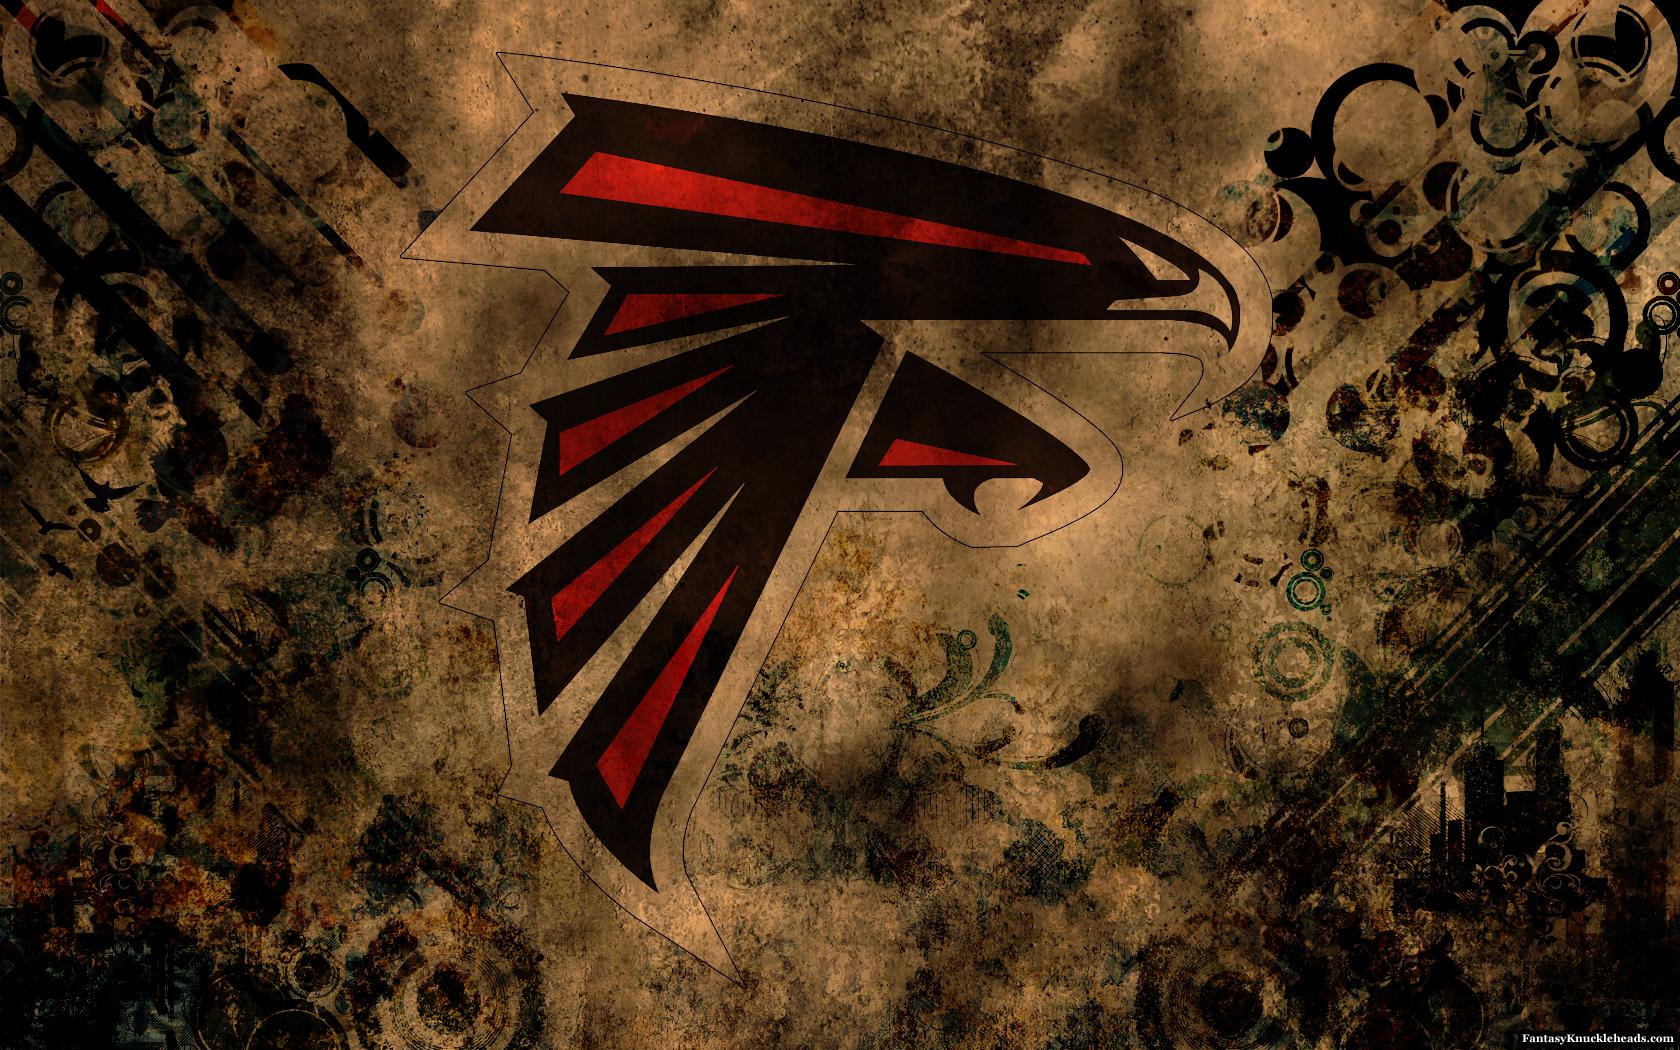 Atlanta Hawks Iphone 6 Wallpaper Redskins Wallpaper 1366x768 69545